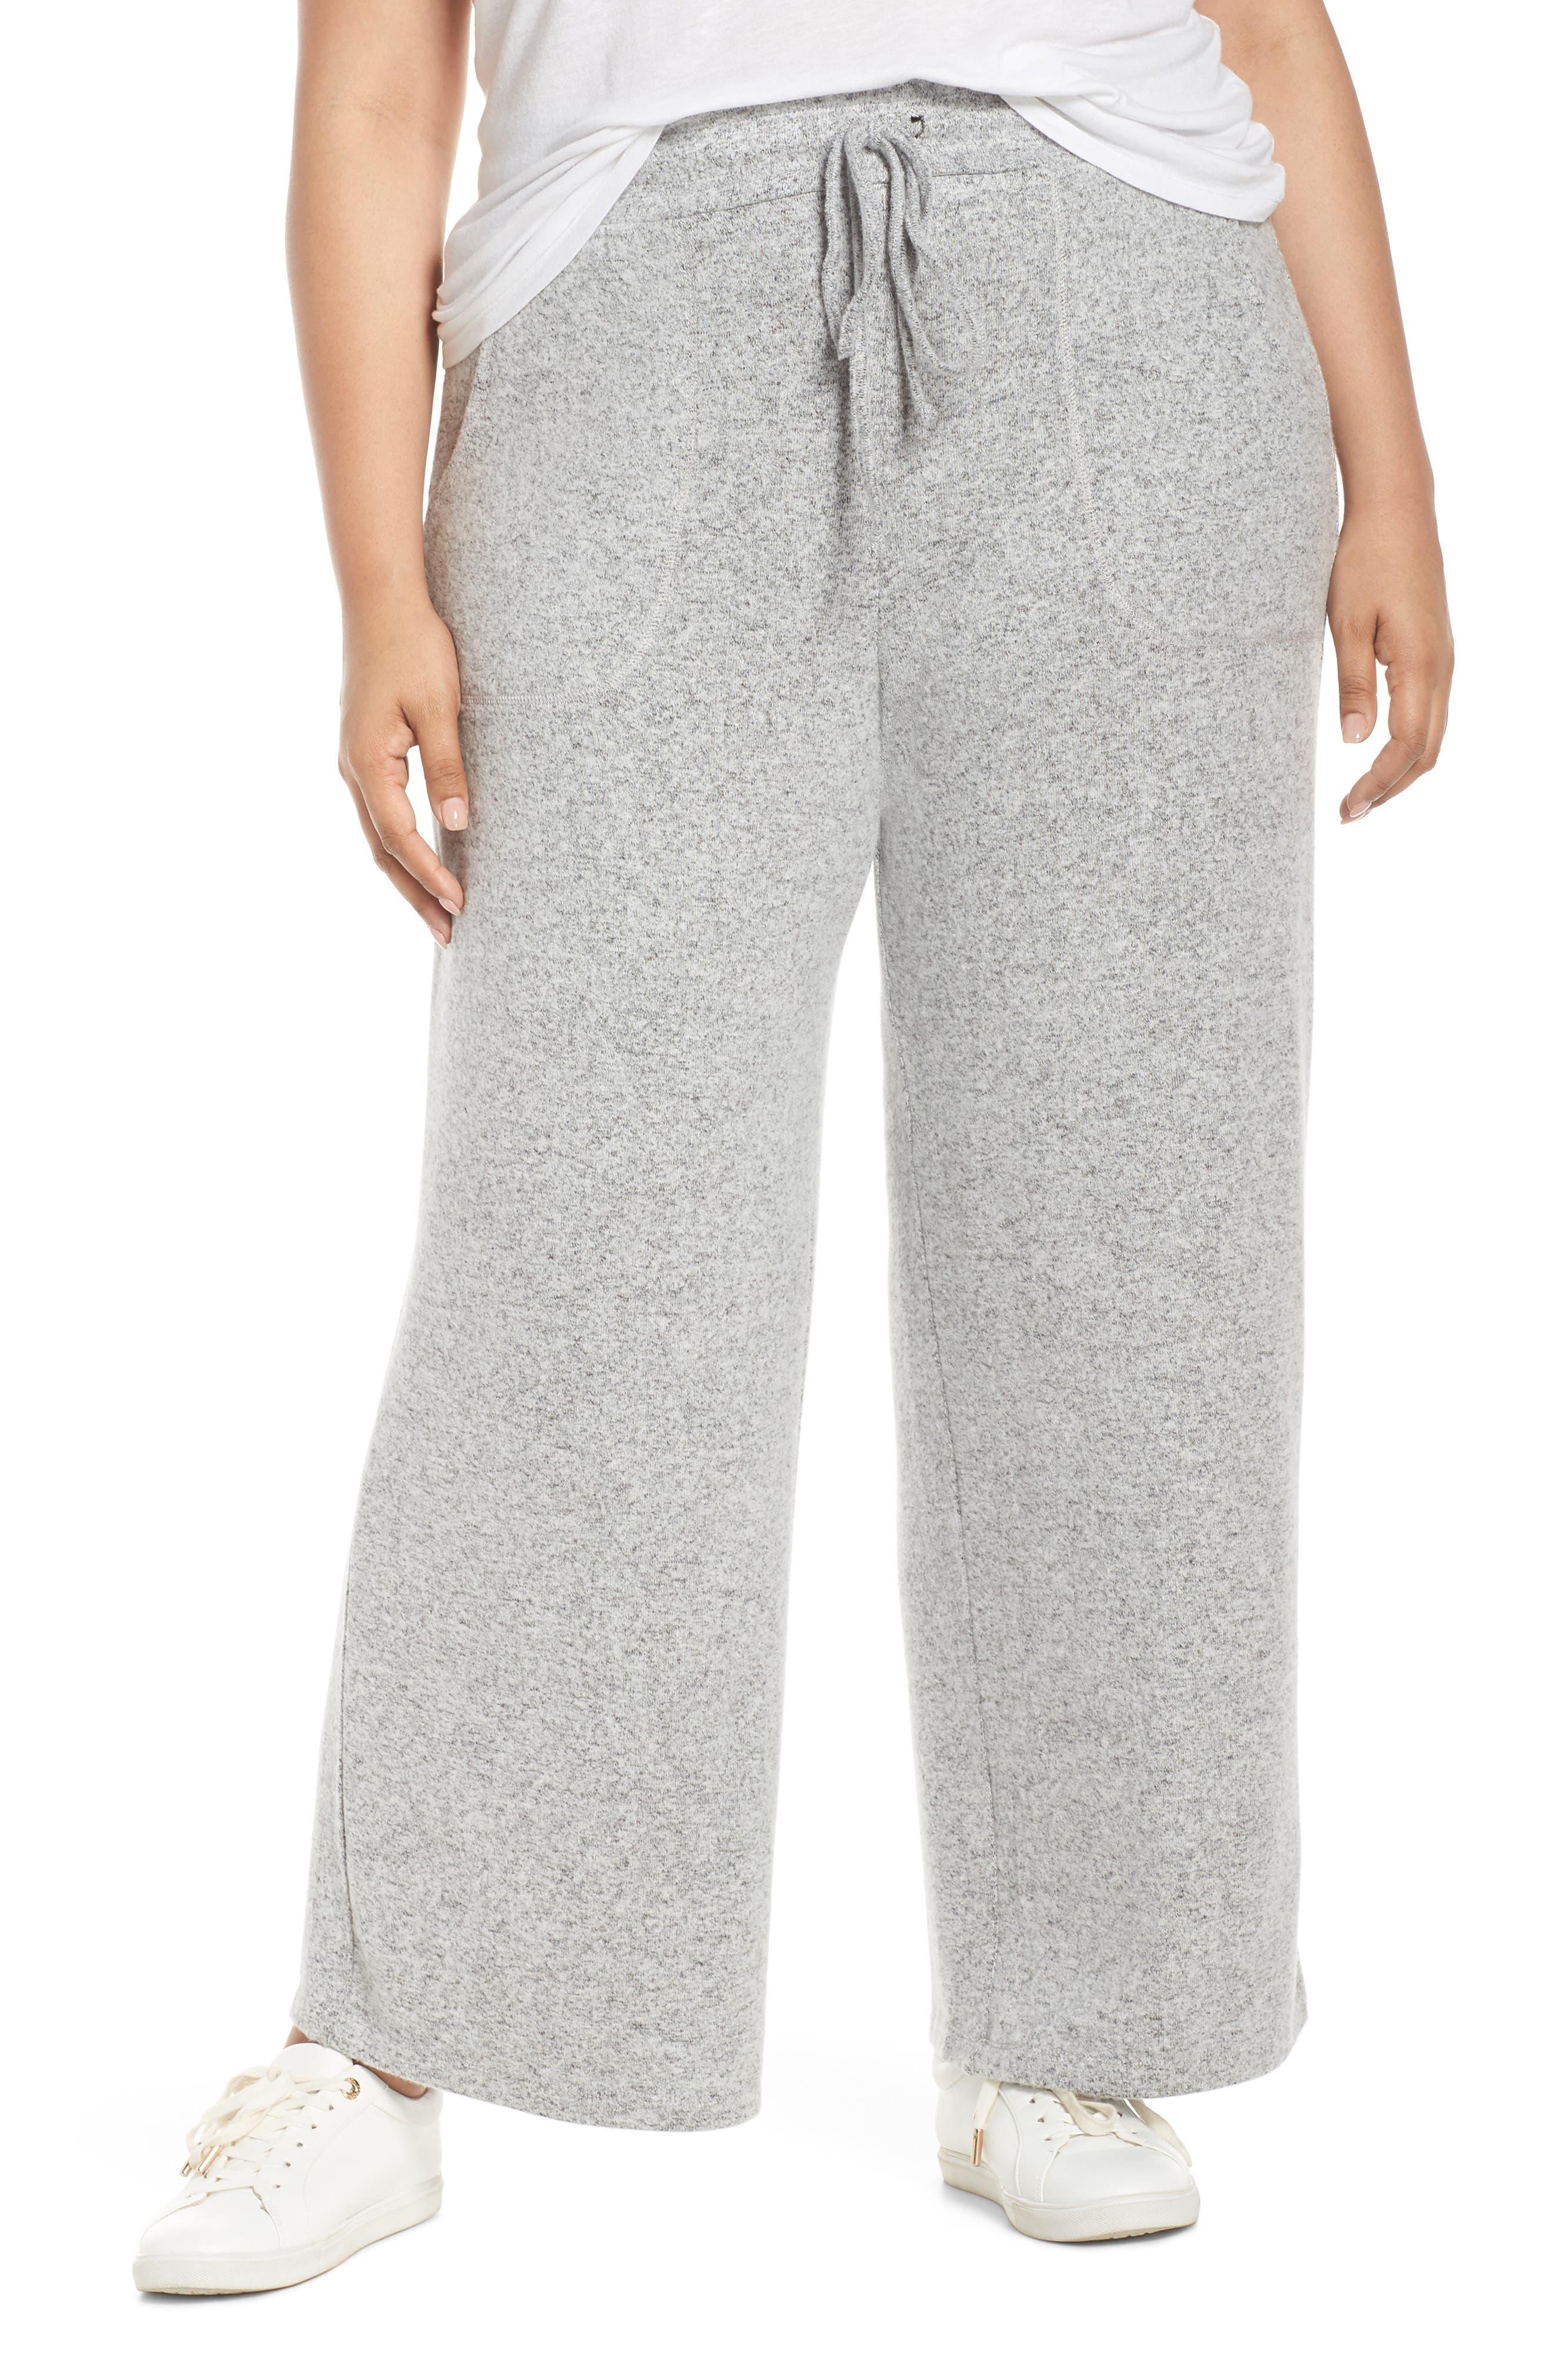 LEMON TART, Norah Knit Lounge Pants, Main thumbnail 1, color, HEATHER GREY